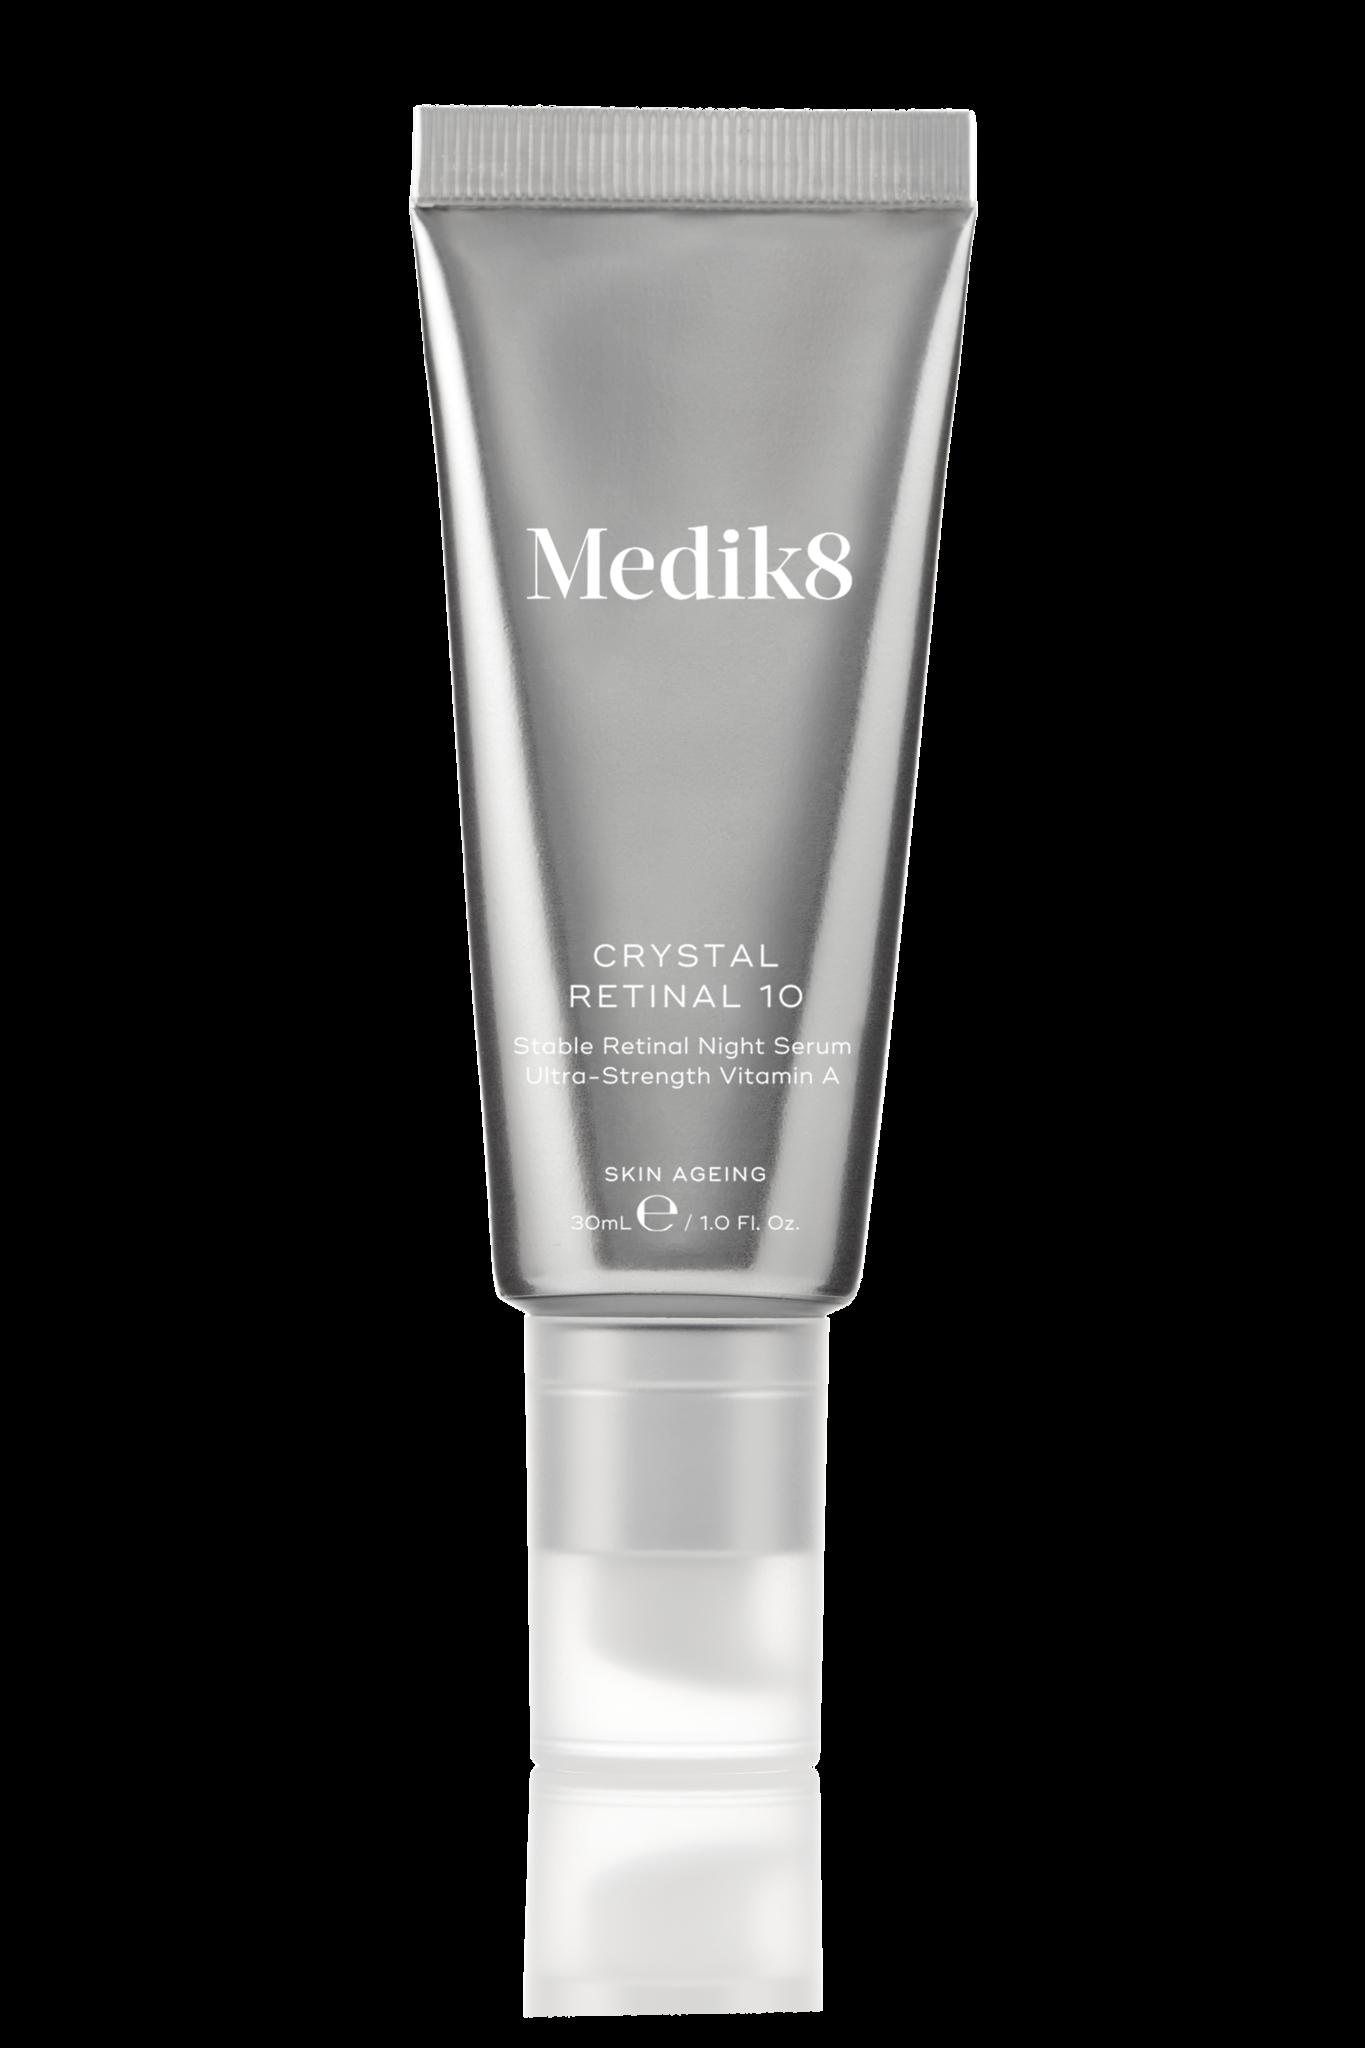 Medik8 Crystal Retinal 10 | Stable Retinal Night Serum Ultra-Strength Vitamin A |30ml